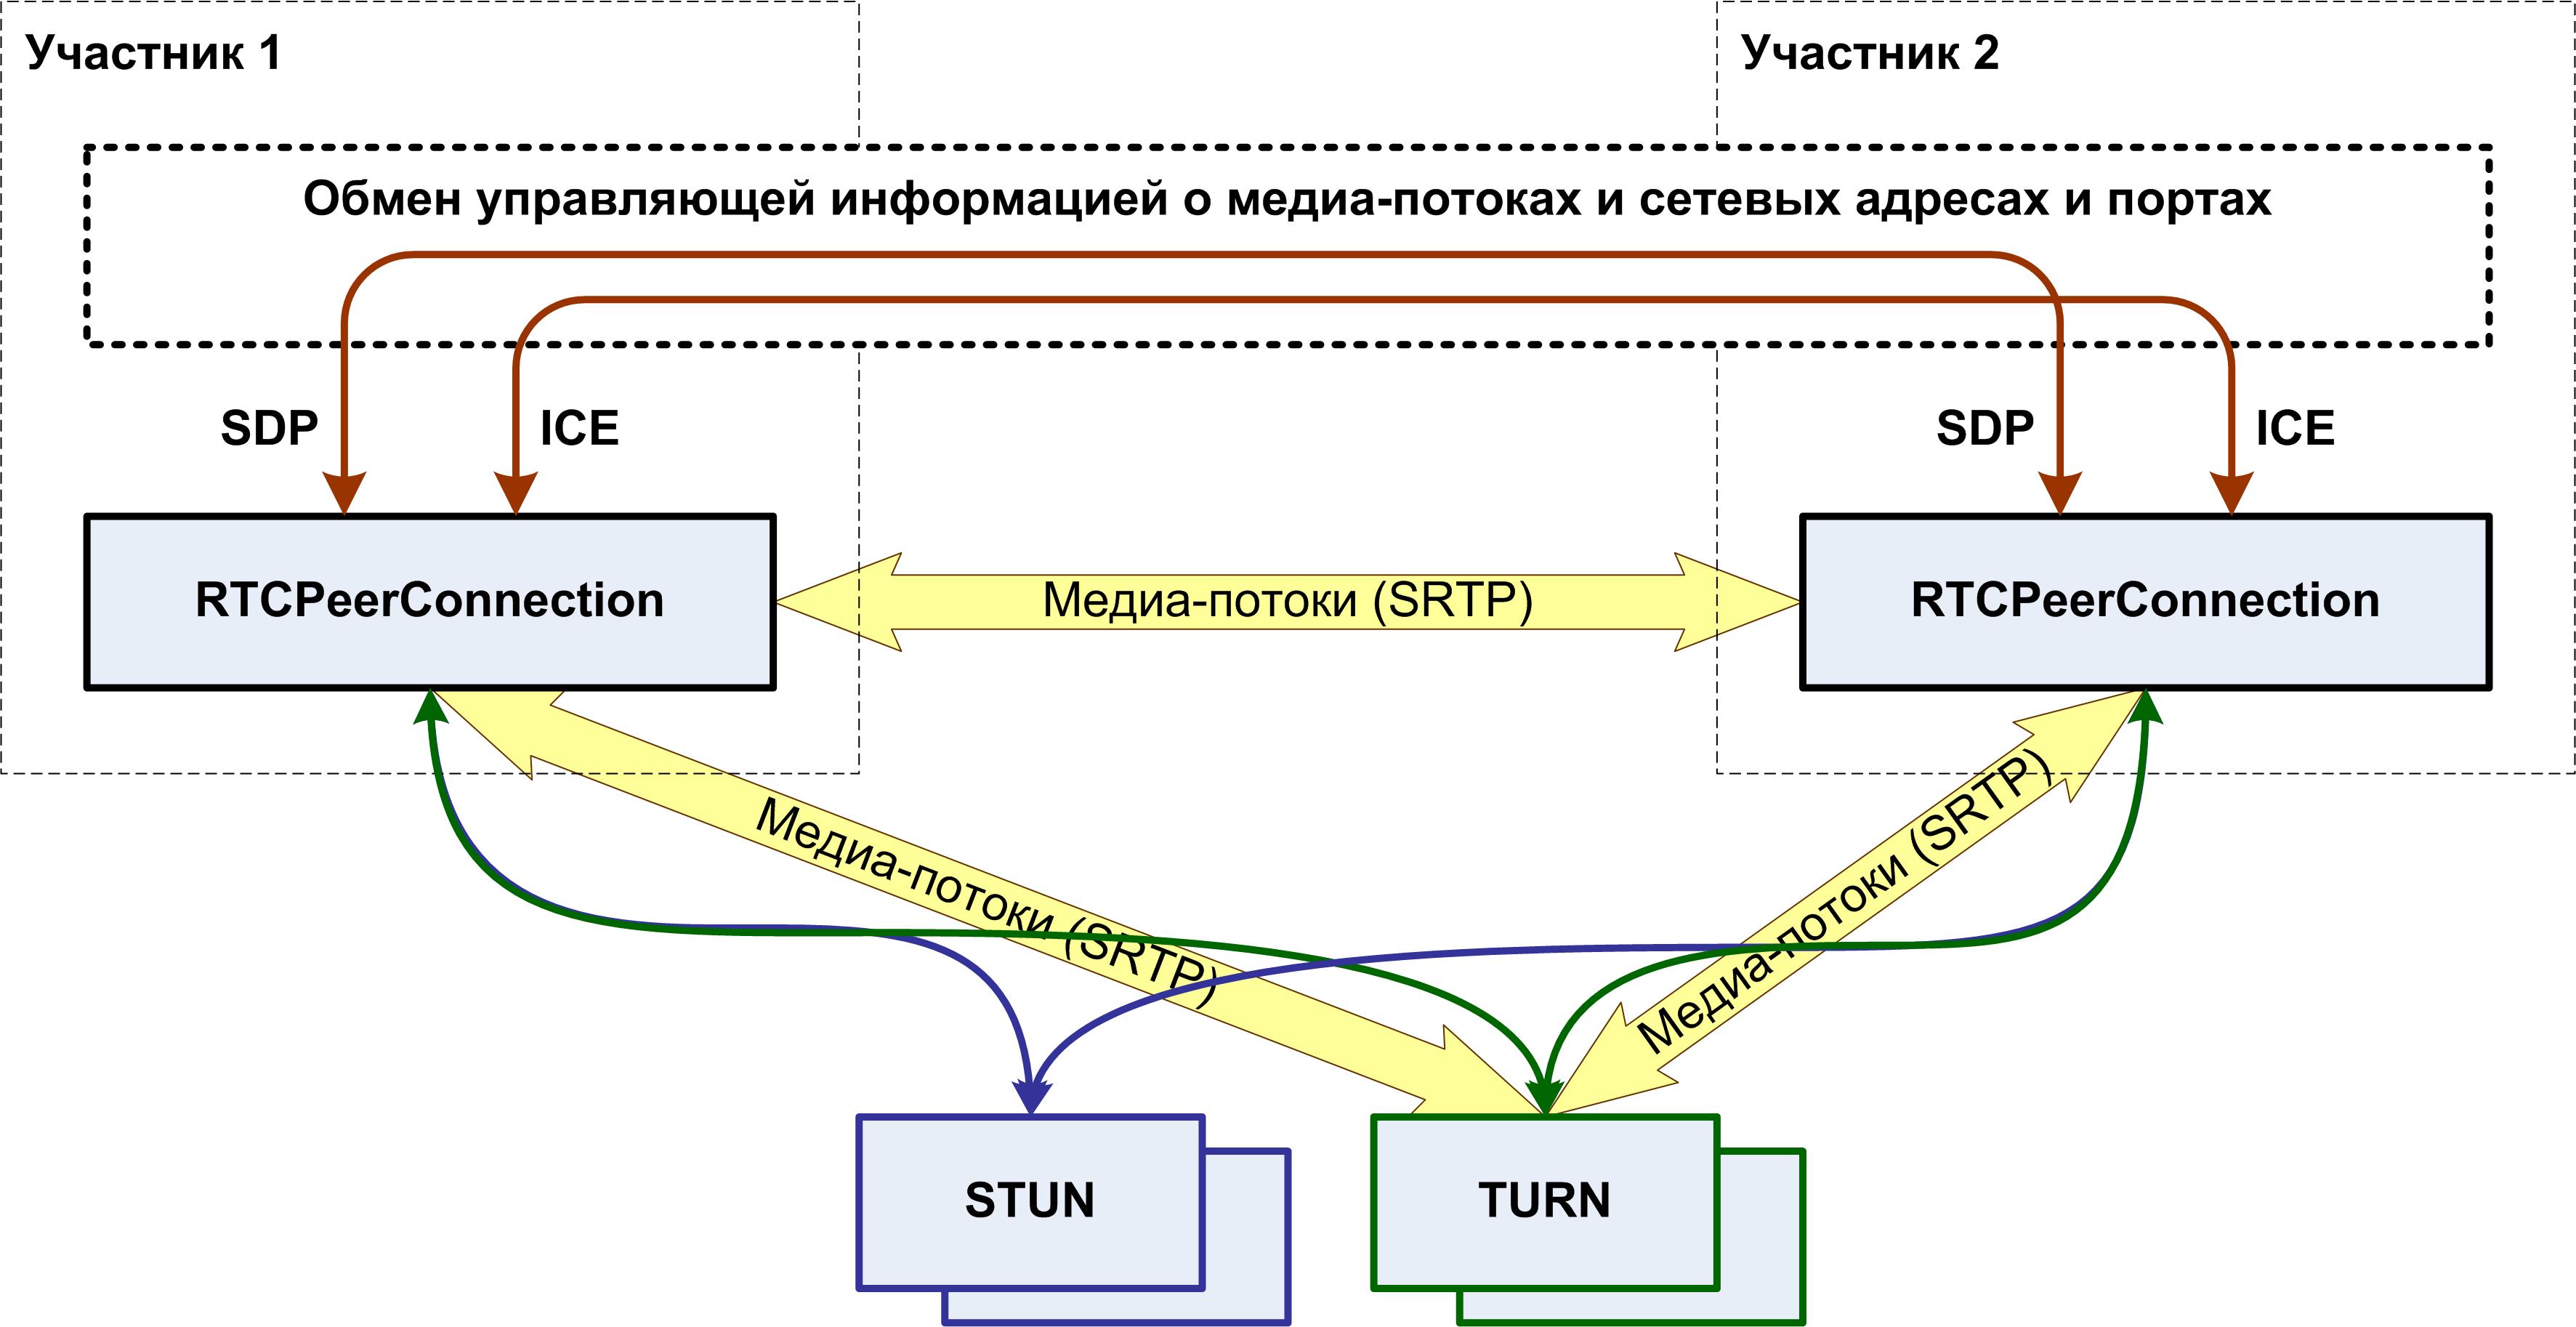 Взаимодействие RTCPeerConnection